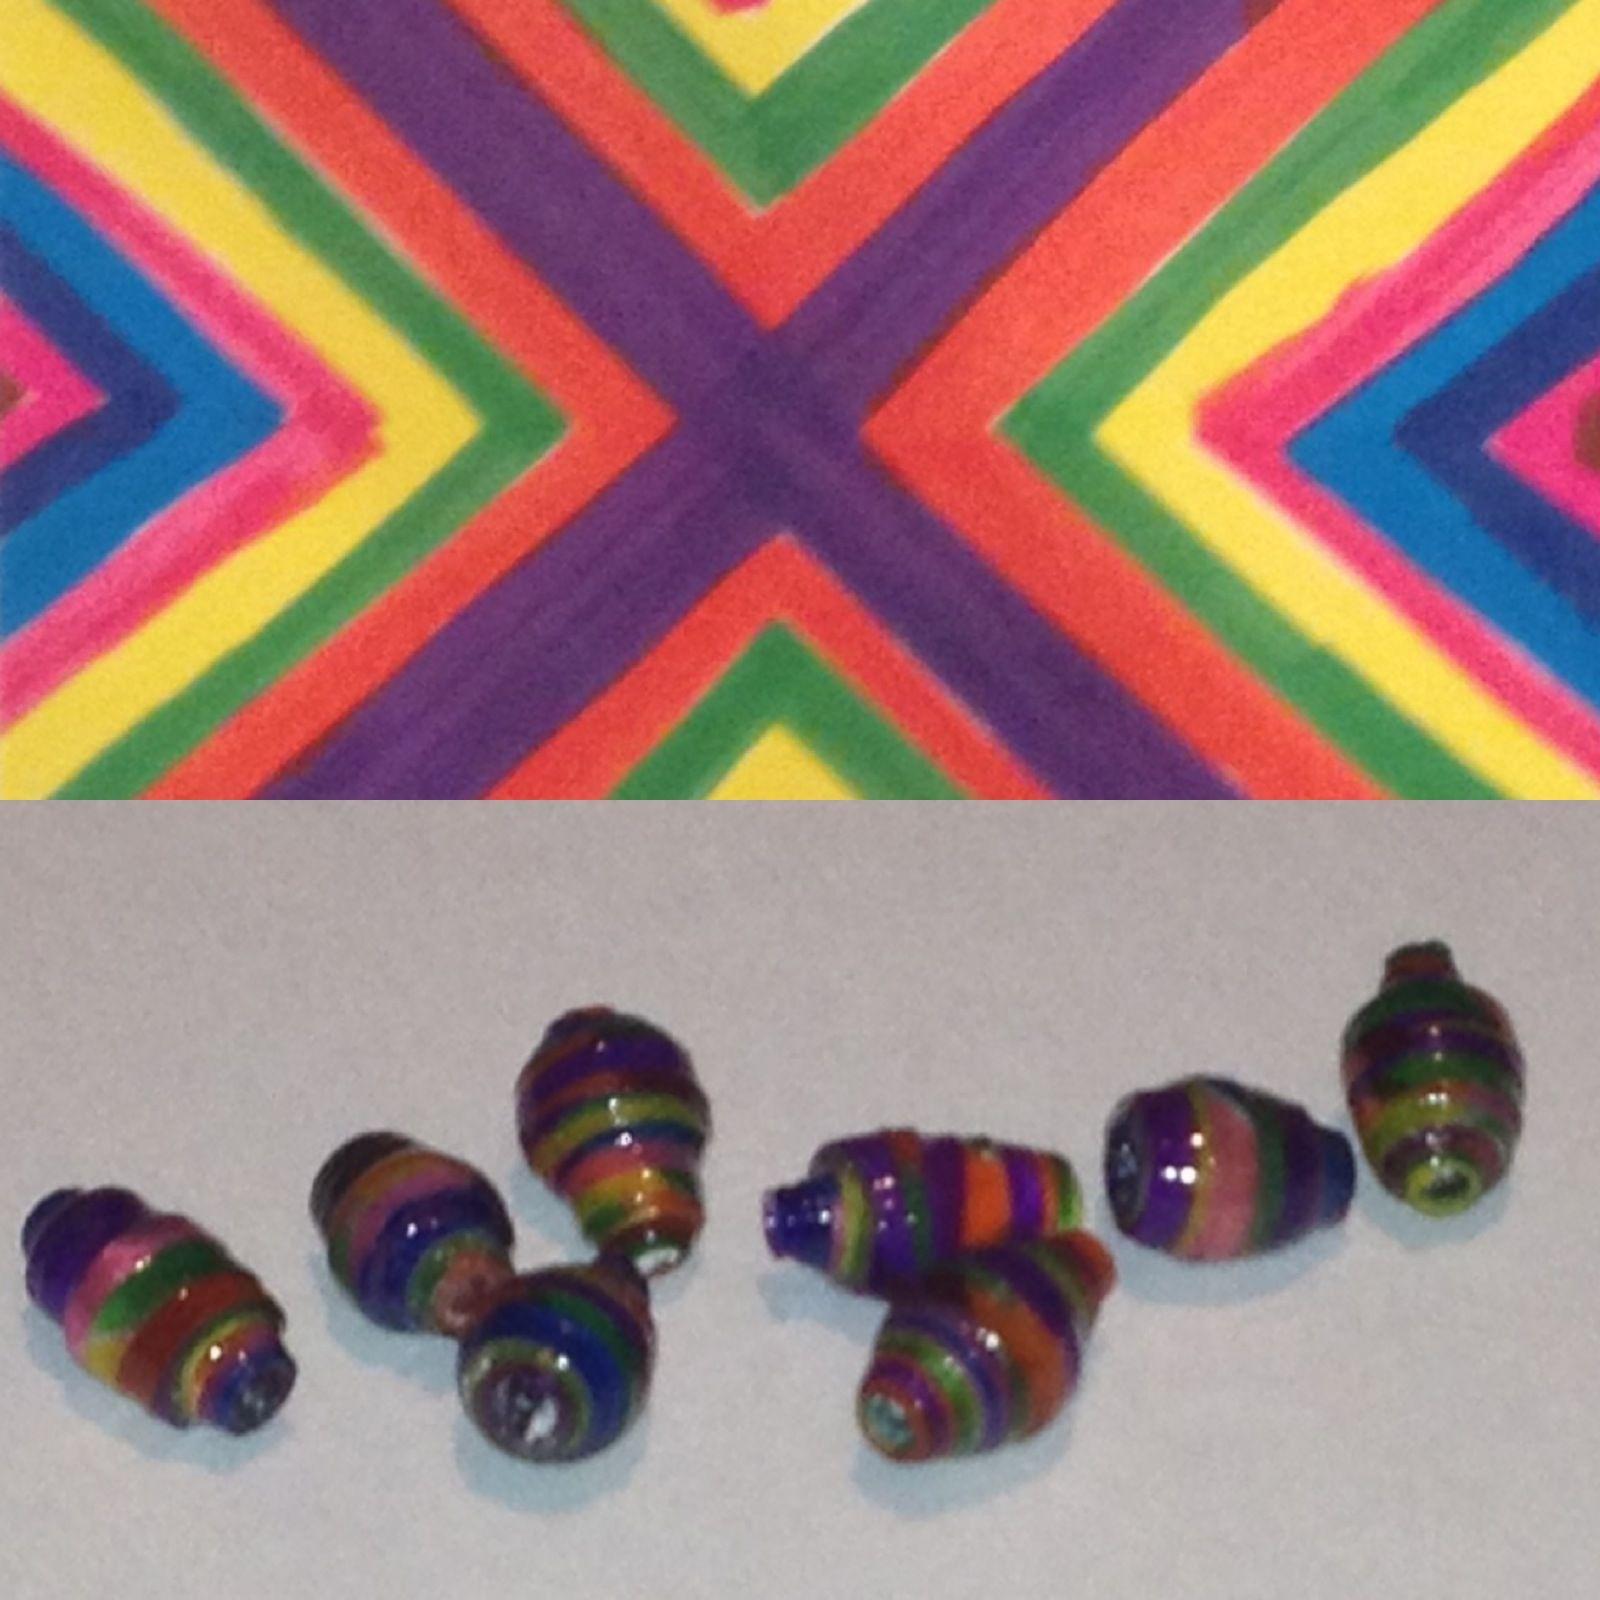 Original paper to bead